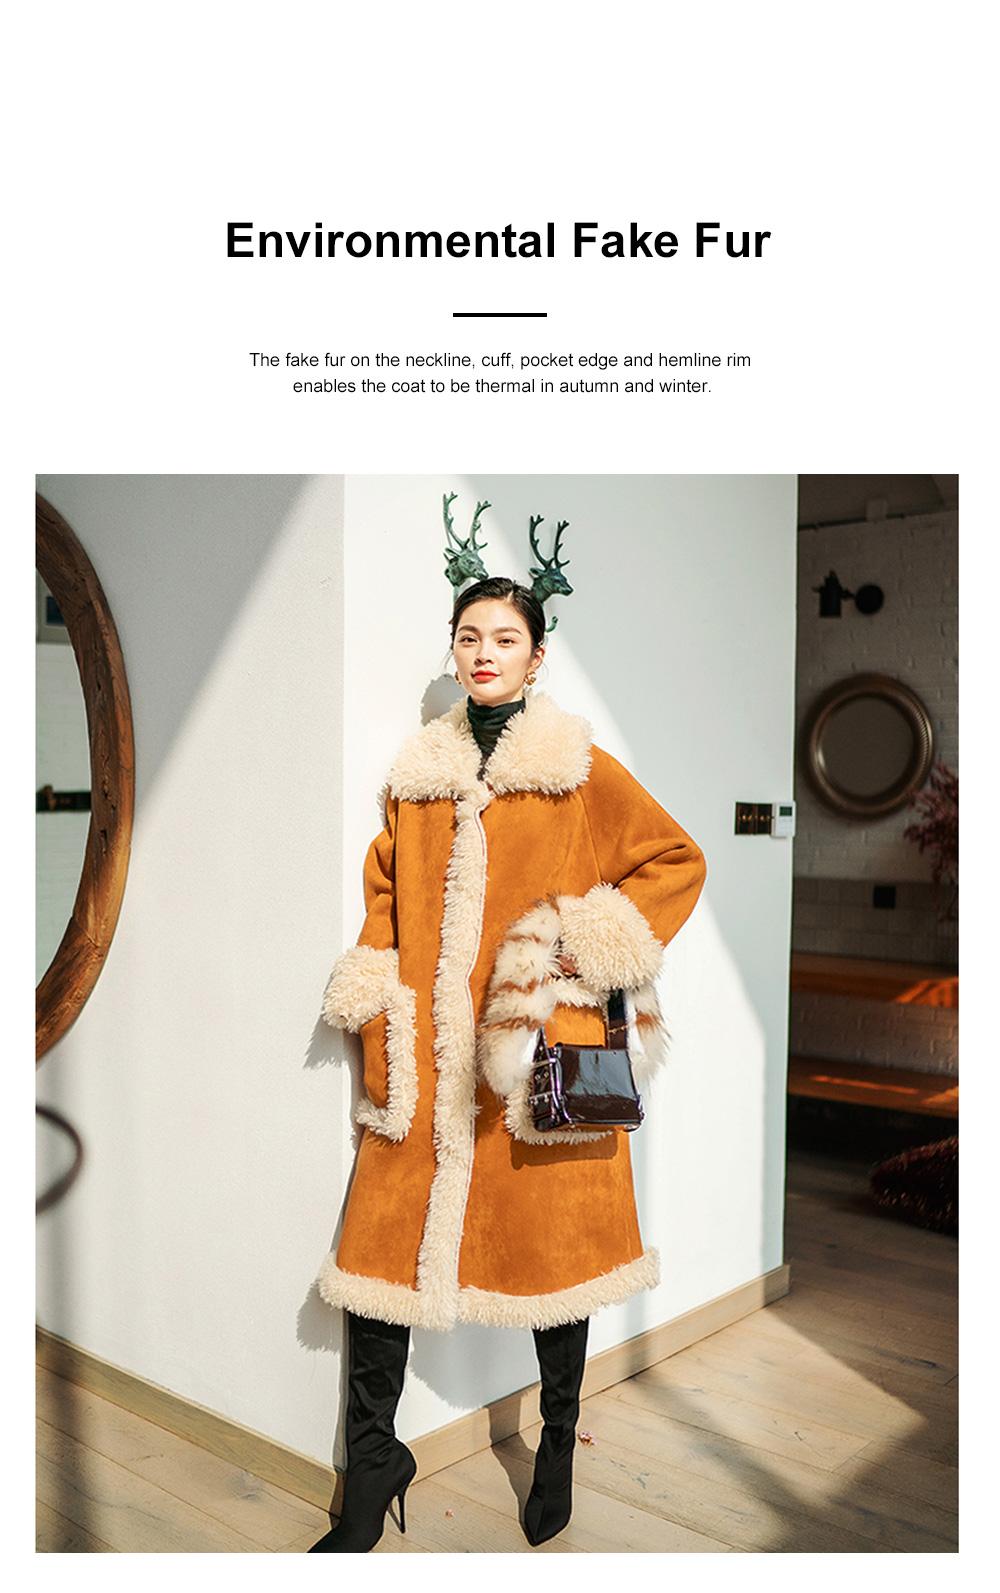 Fake Fur Long Coat for Women Wear Imitated Lamb Wool Great Coat Autumn Winter 2019 3